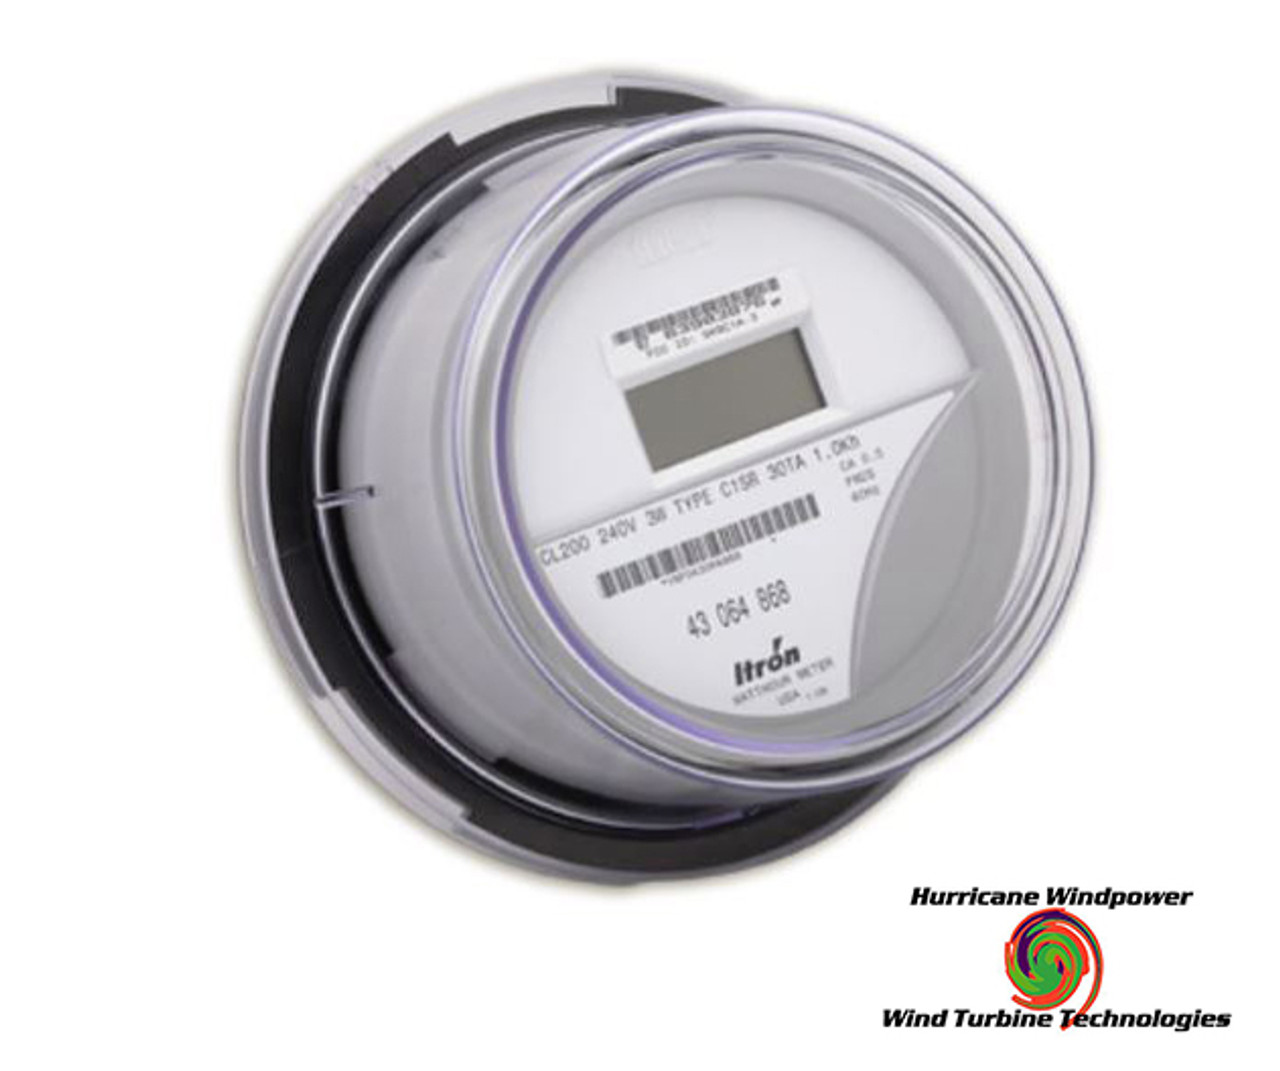 ITRON Kilowatt Hour Meter Form 2S LCD Digital 240VAC CL200 SP-IT-CENTRON-C1S